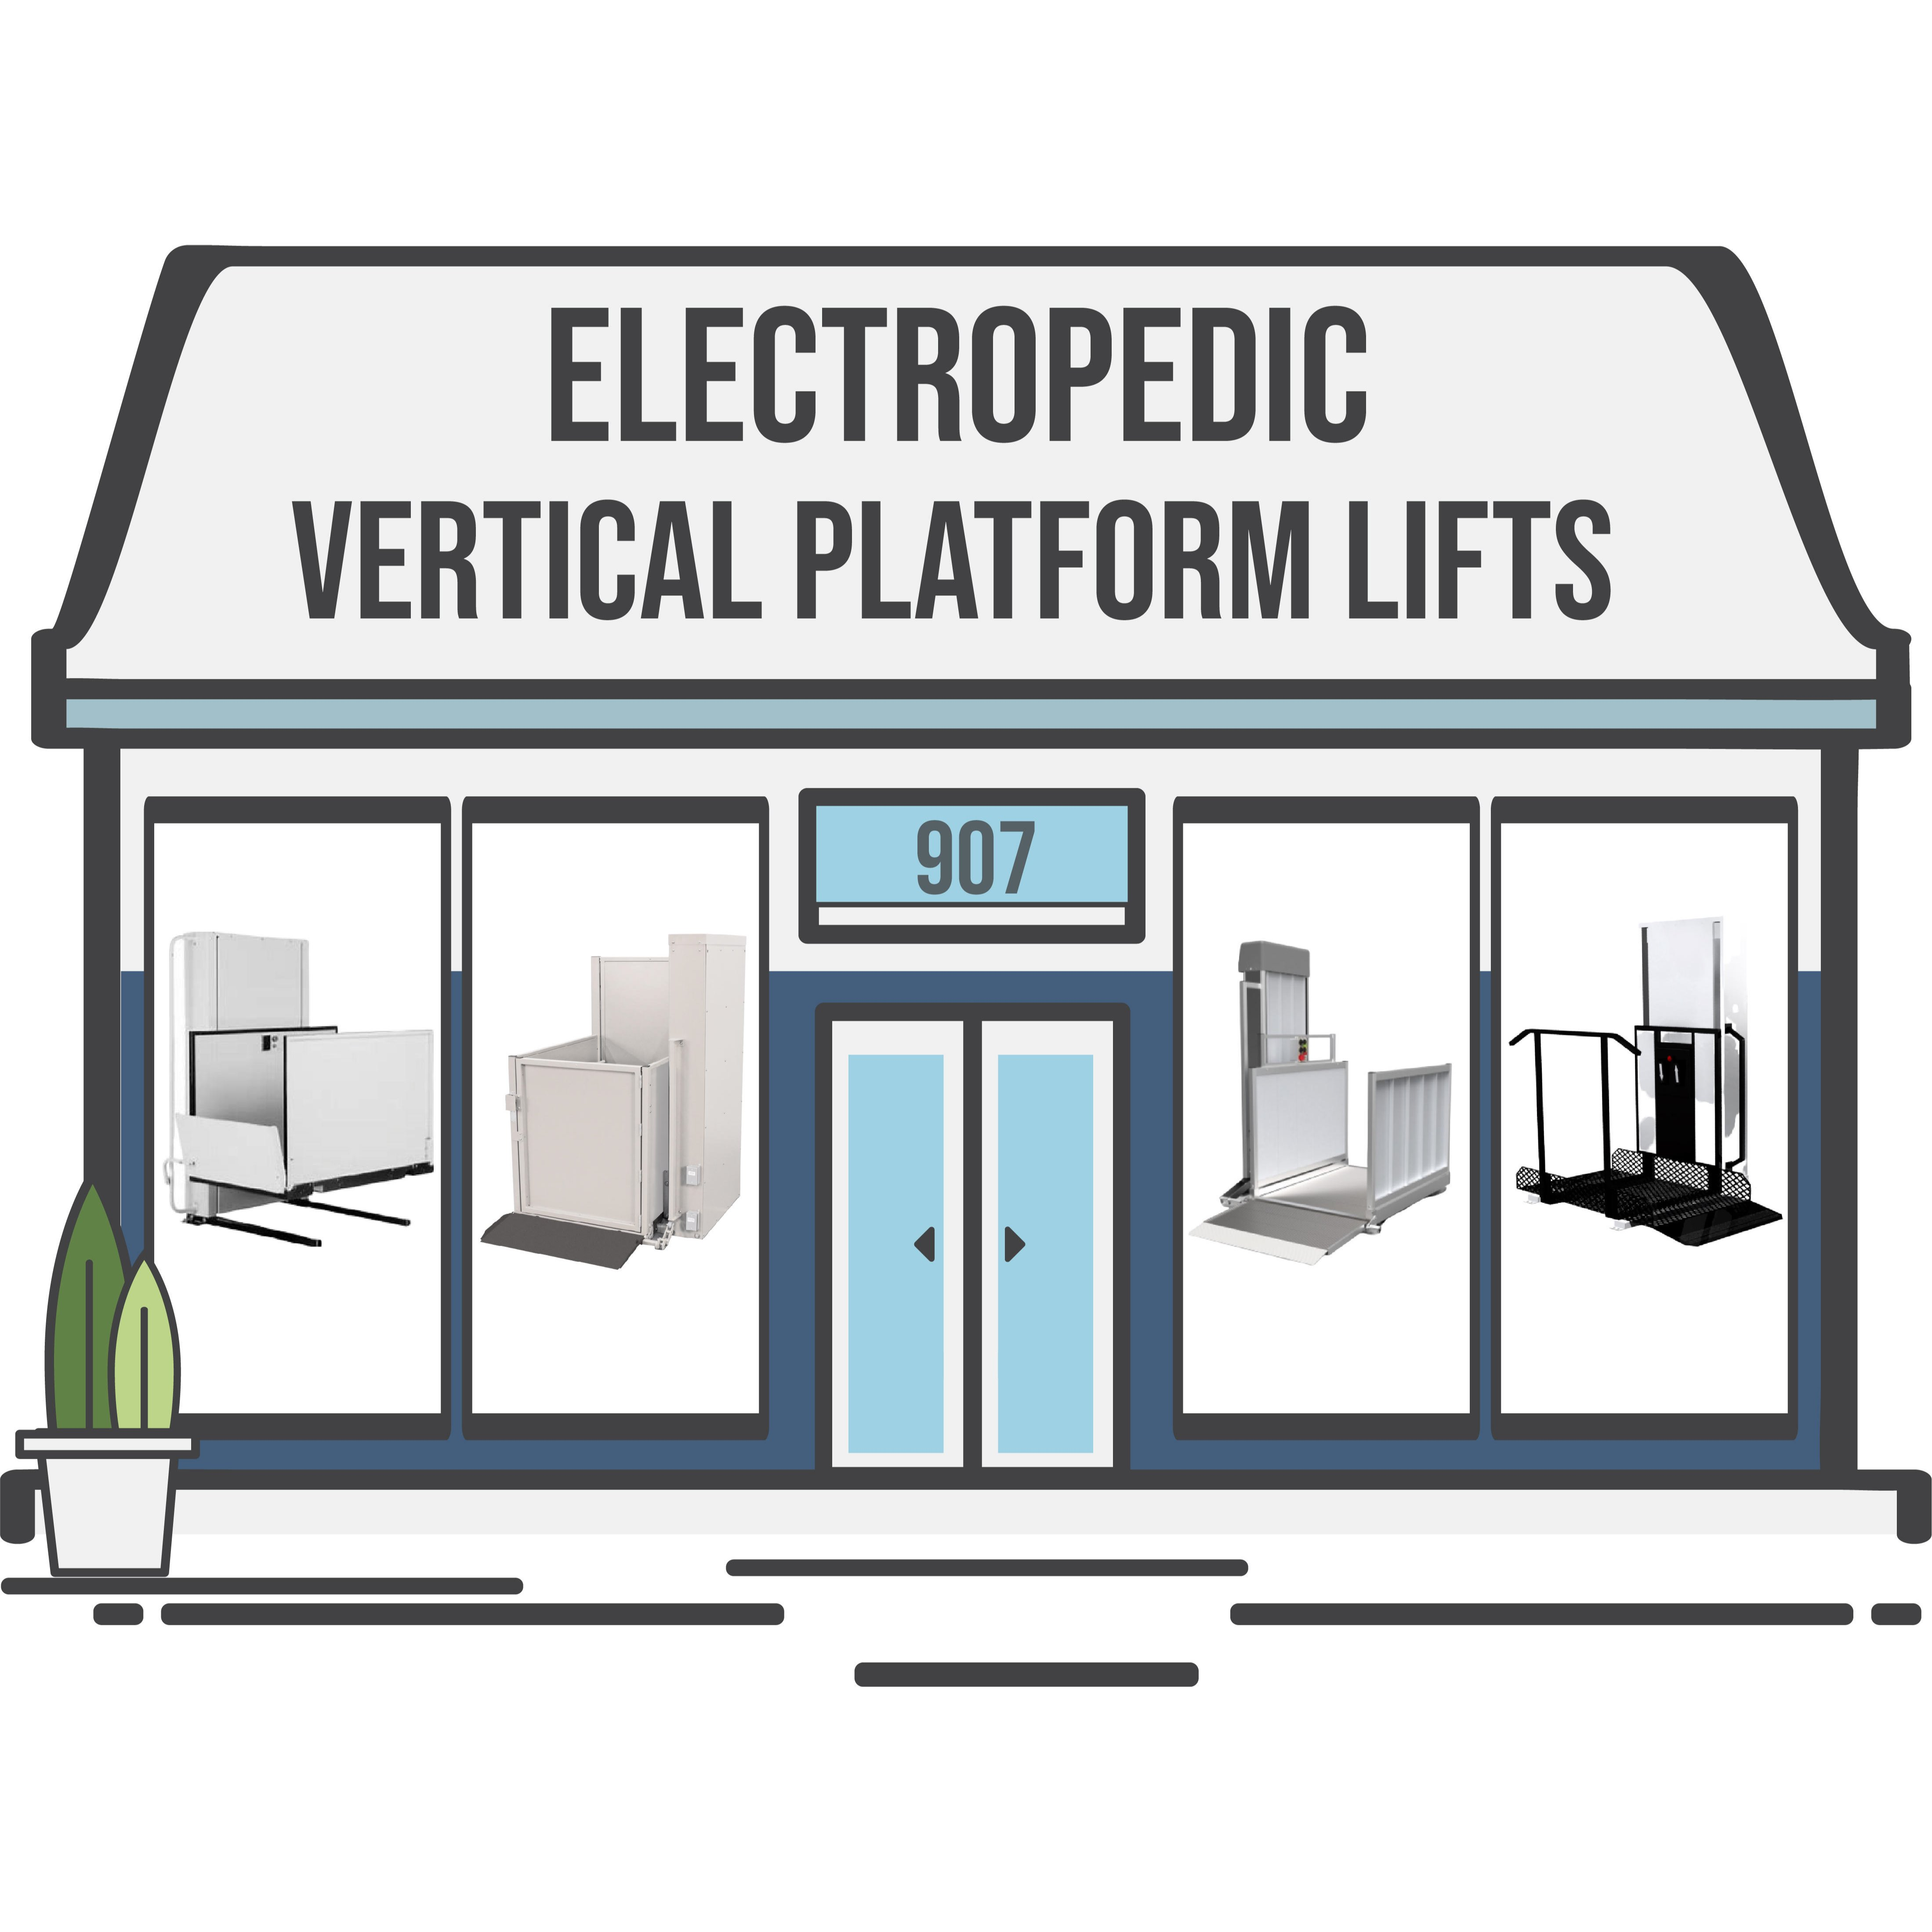 Electropedic Vertical Platform Lifts